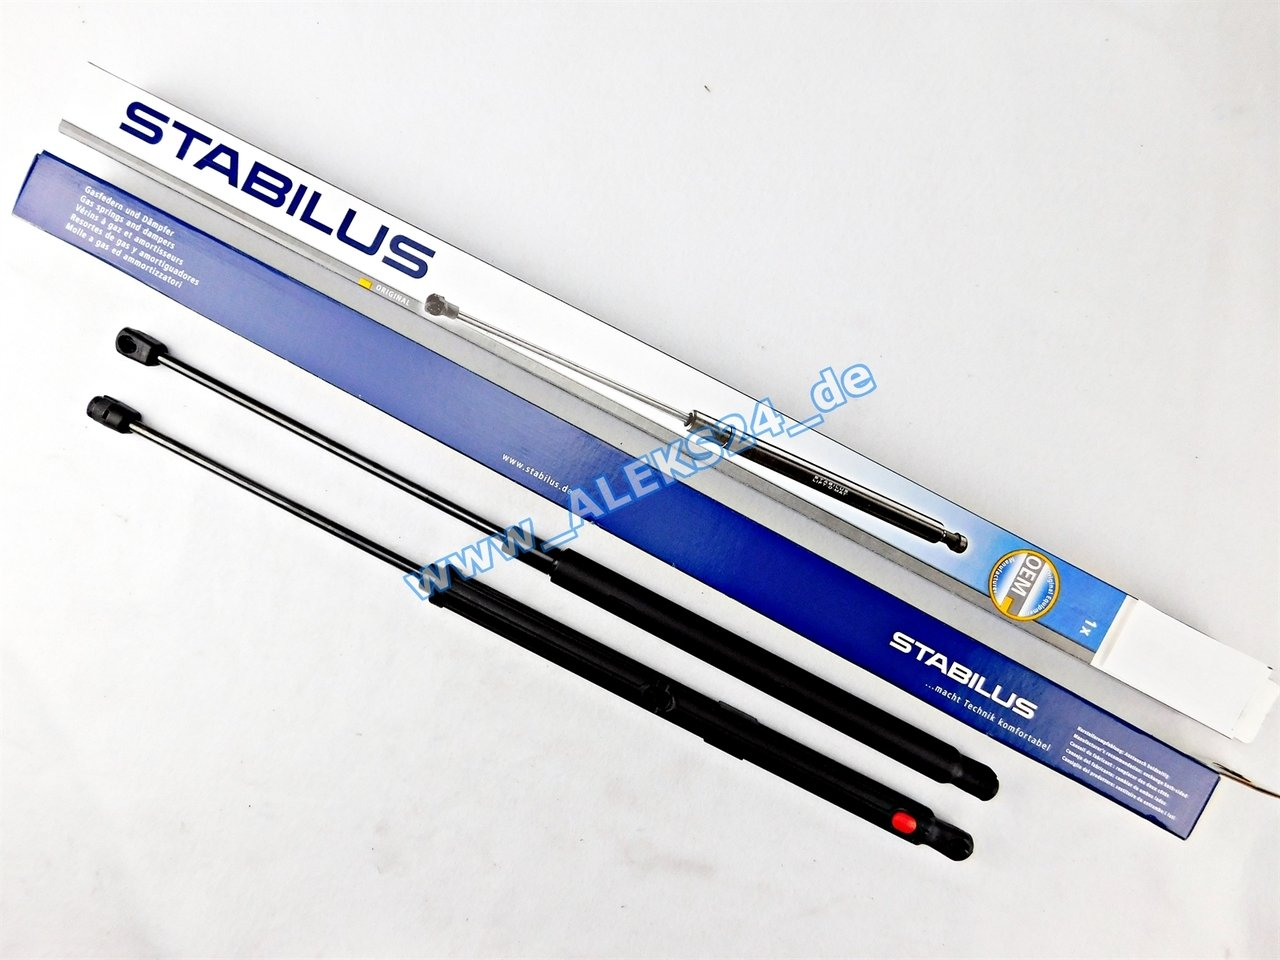 2 x Stabilus Lift 3-O Mat Lifter Ammortizzatore Molla a Gas Cofano Classe C W203 3477 X W + 3474 X K